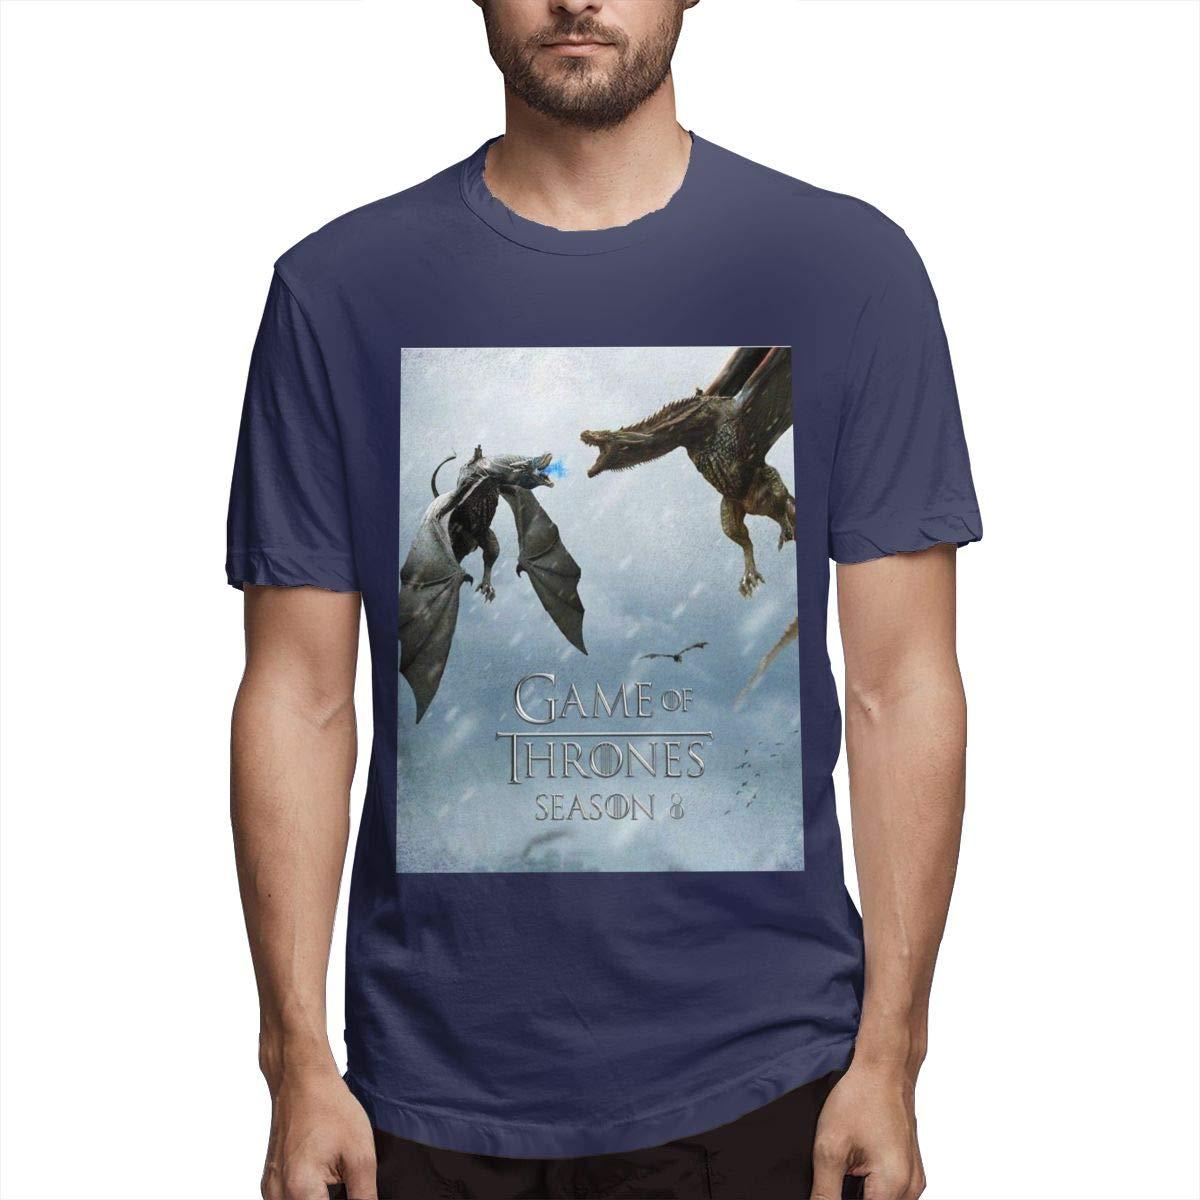 Kinggo Printing Comfortable Game Of Thrones Short Sleeve Humor T Shirts Black